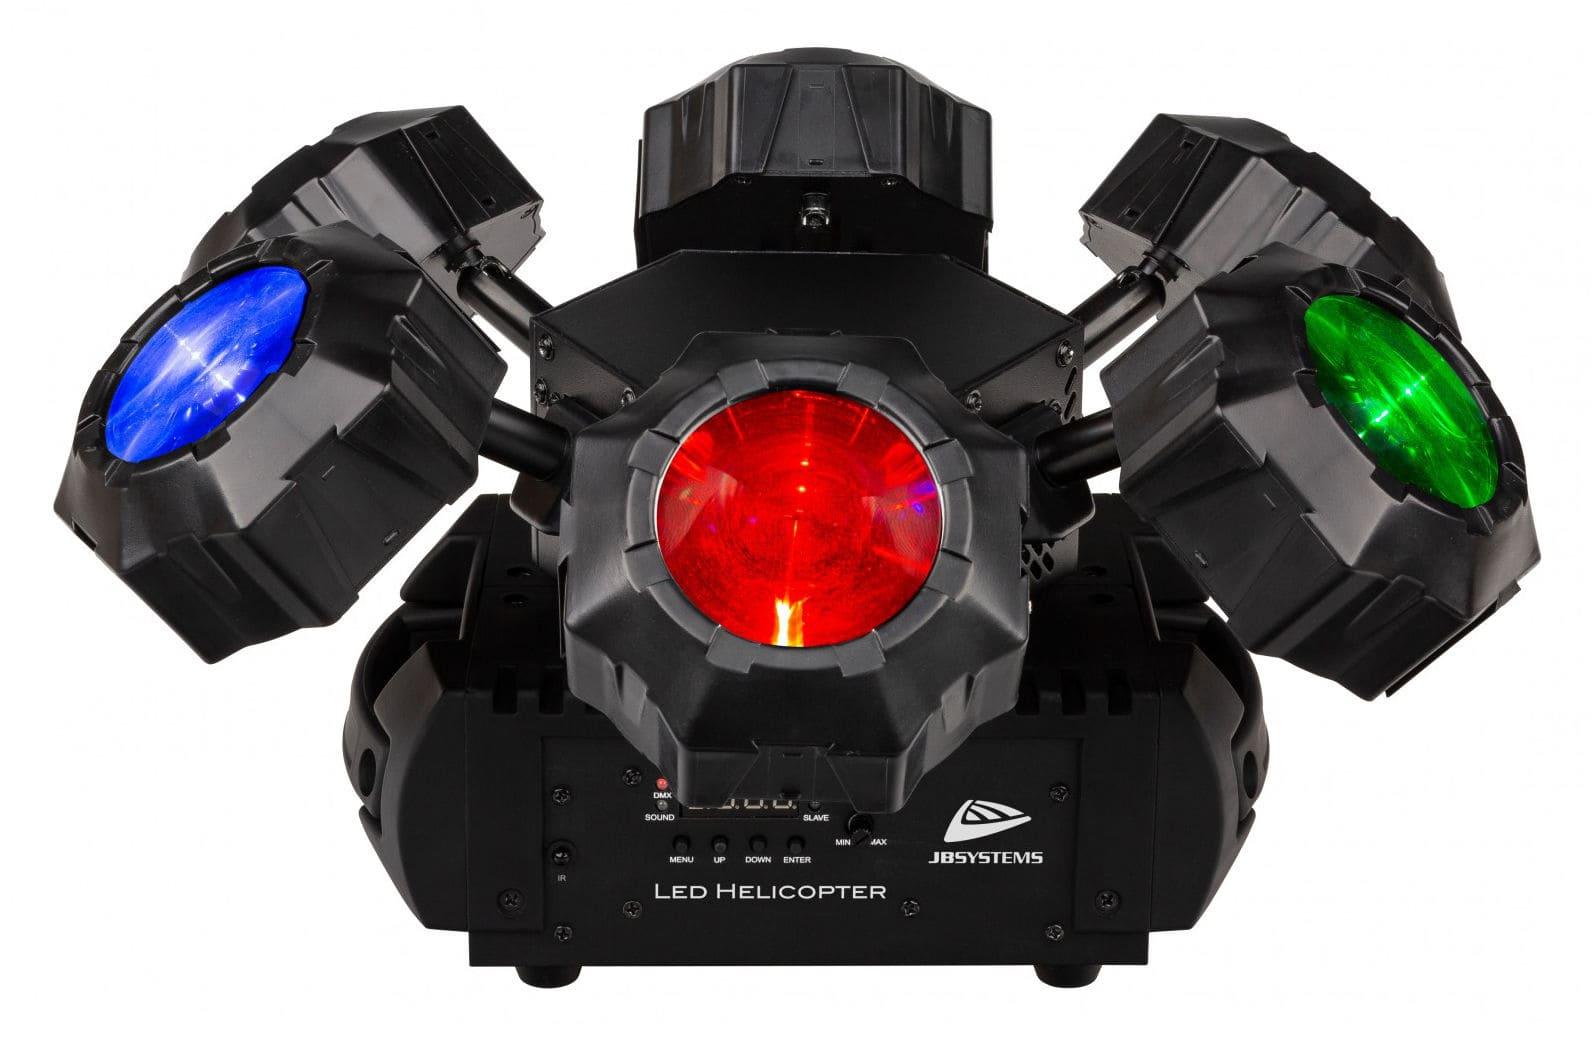 Lichteffekte - JB Systems LED Helicopter - Onlineshop Musikhaus Kirstein